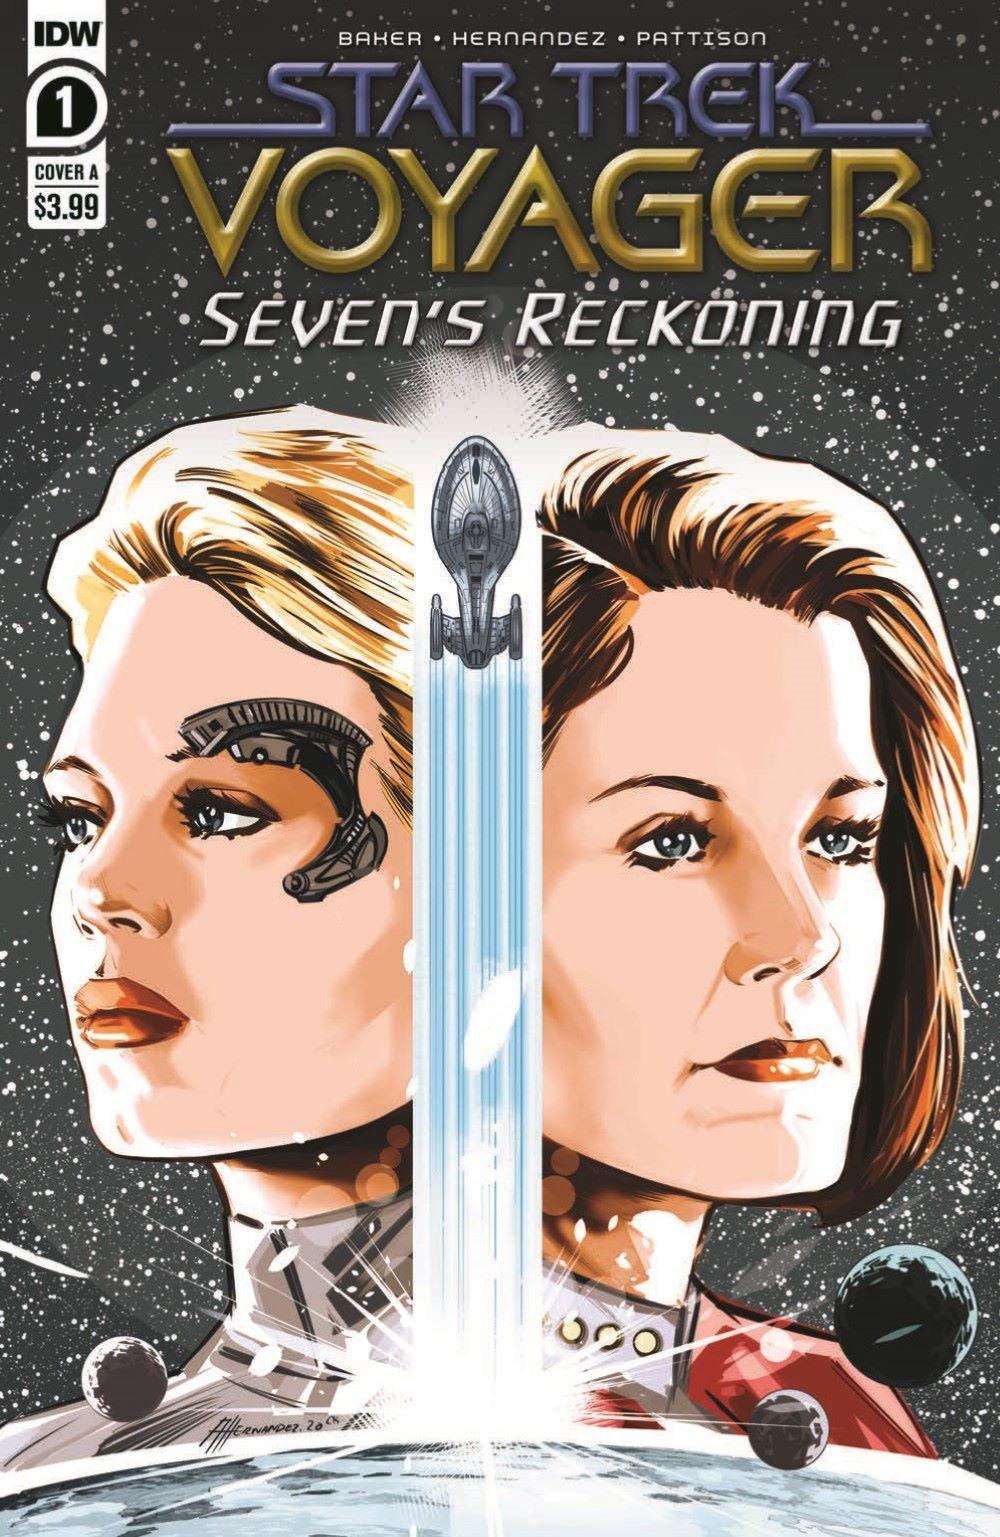 ST_Voyager_SR01-pr-1 ComicList Previews: STAR TREK VOYAGER SEVEN'S RECKONING #1 (OF 4)